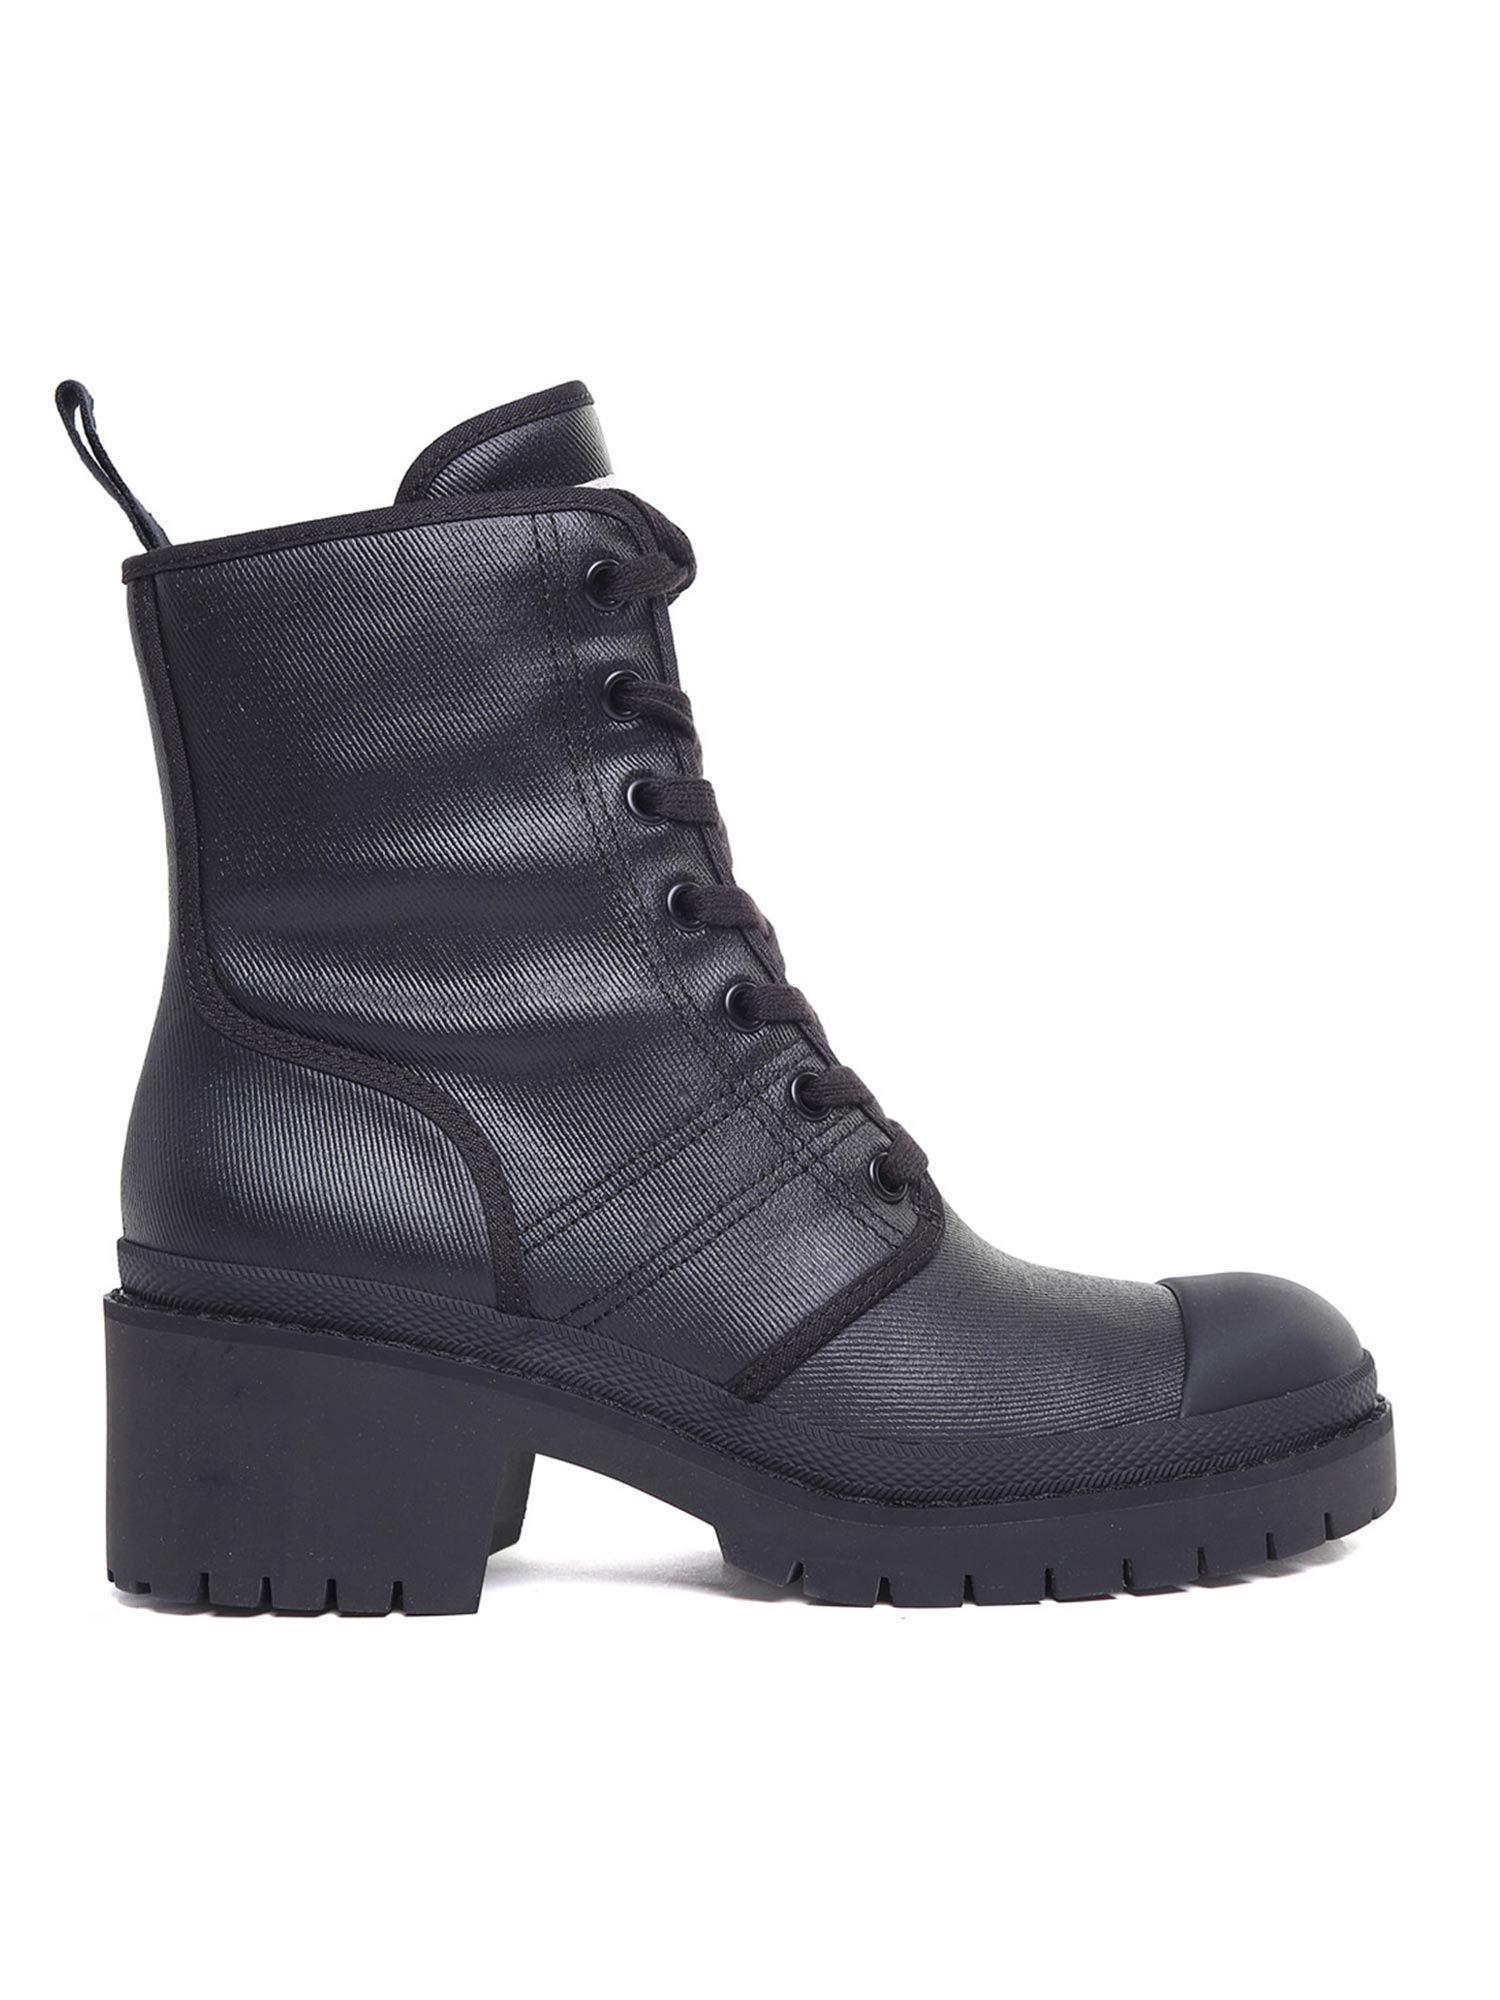 f8a5fa61bb76d6 Jacobs Lyst Marc In Combact Boots Bristol Black 8xUqRT